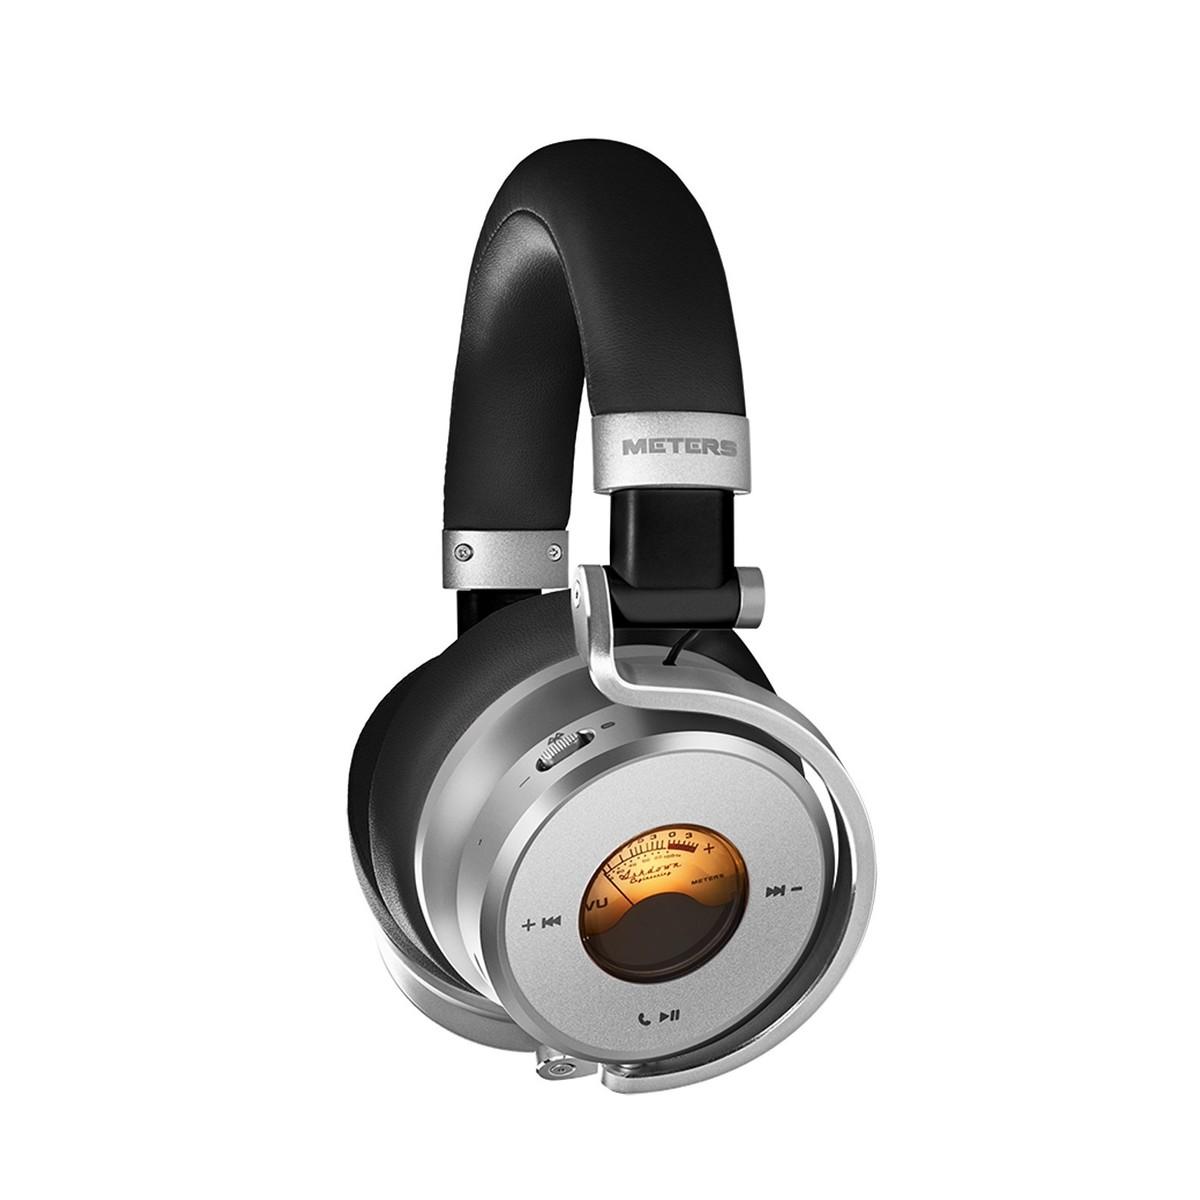 OV-1-B m Bluetooth in-Ear-Kopfhörer, Black bei Gear4music